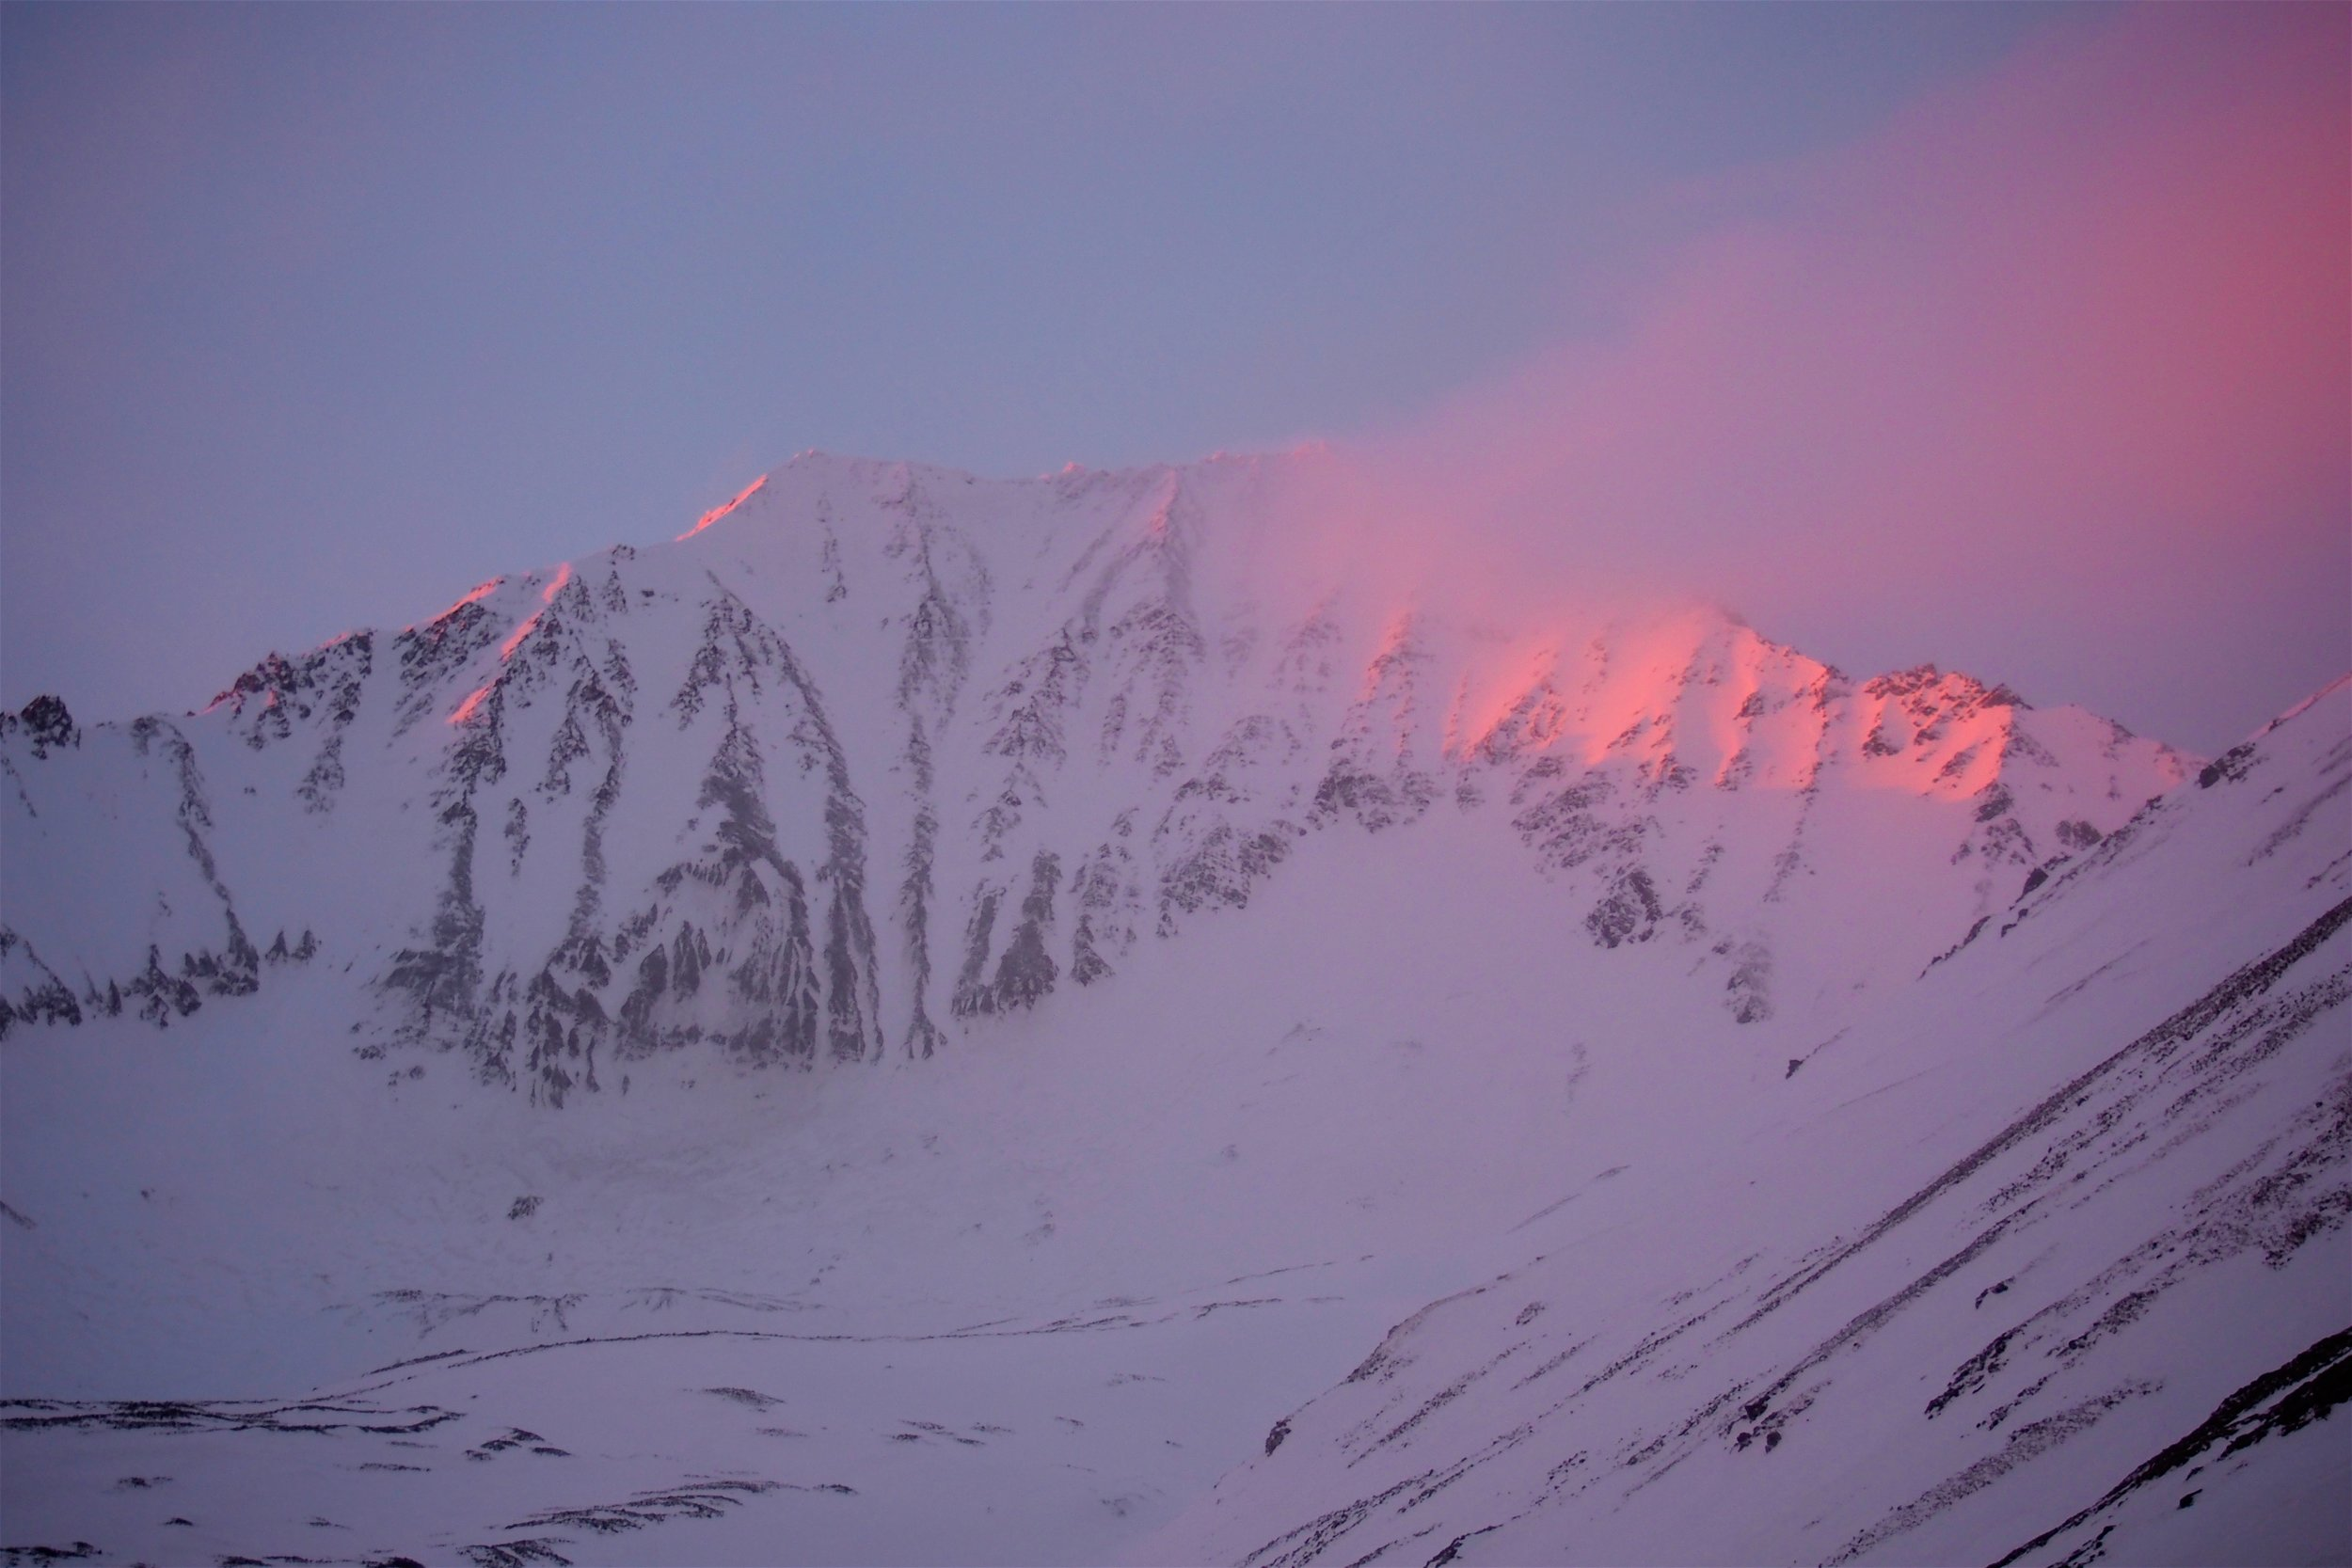 Good life decision = Mountaineering in the Yukon Territory.